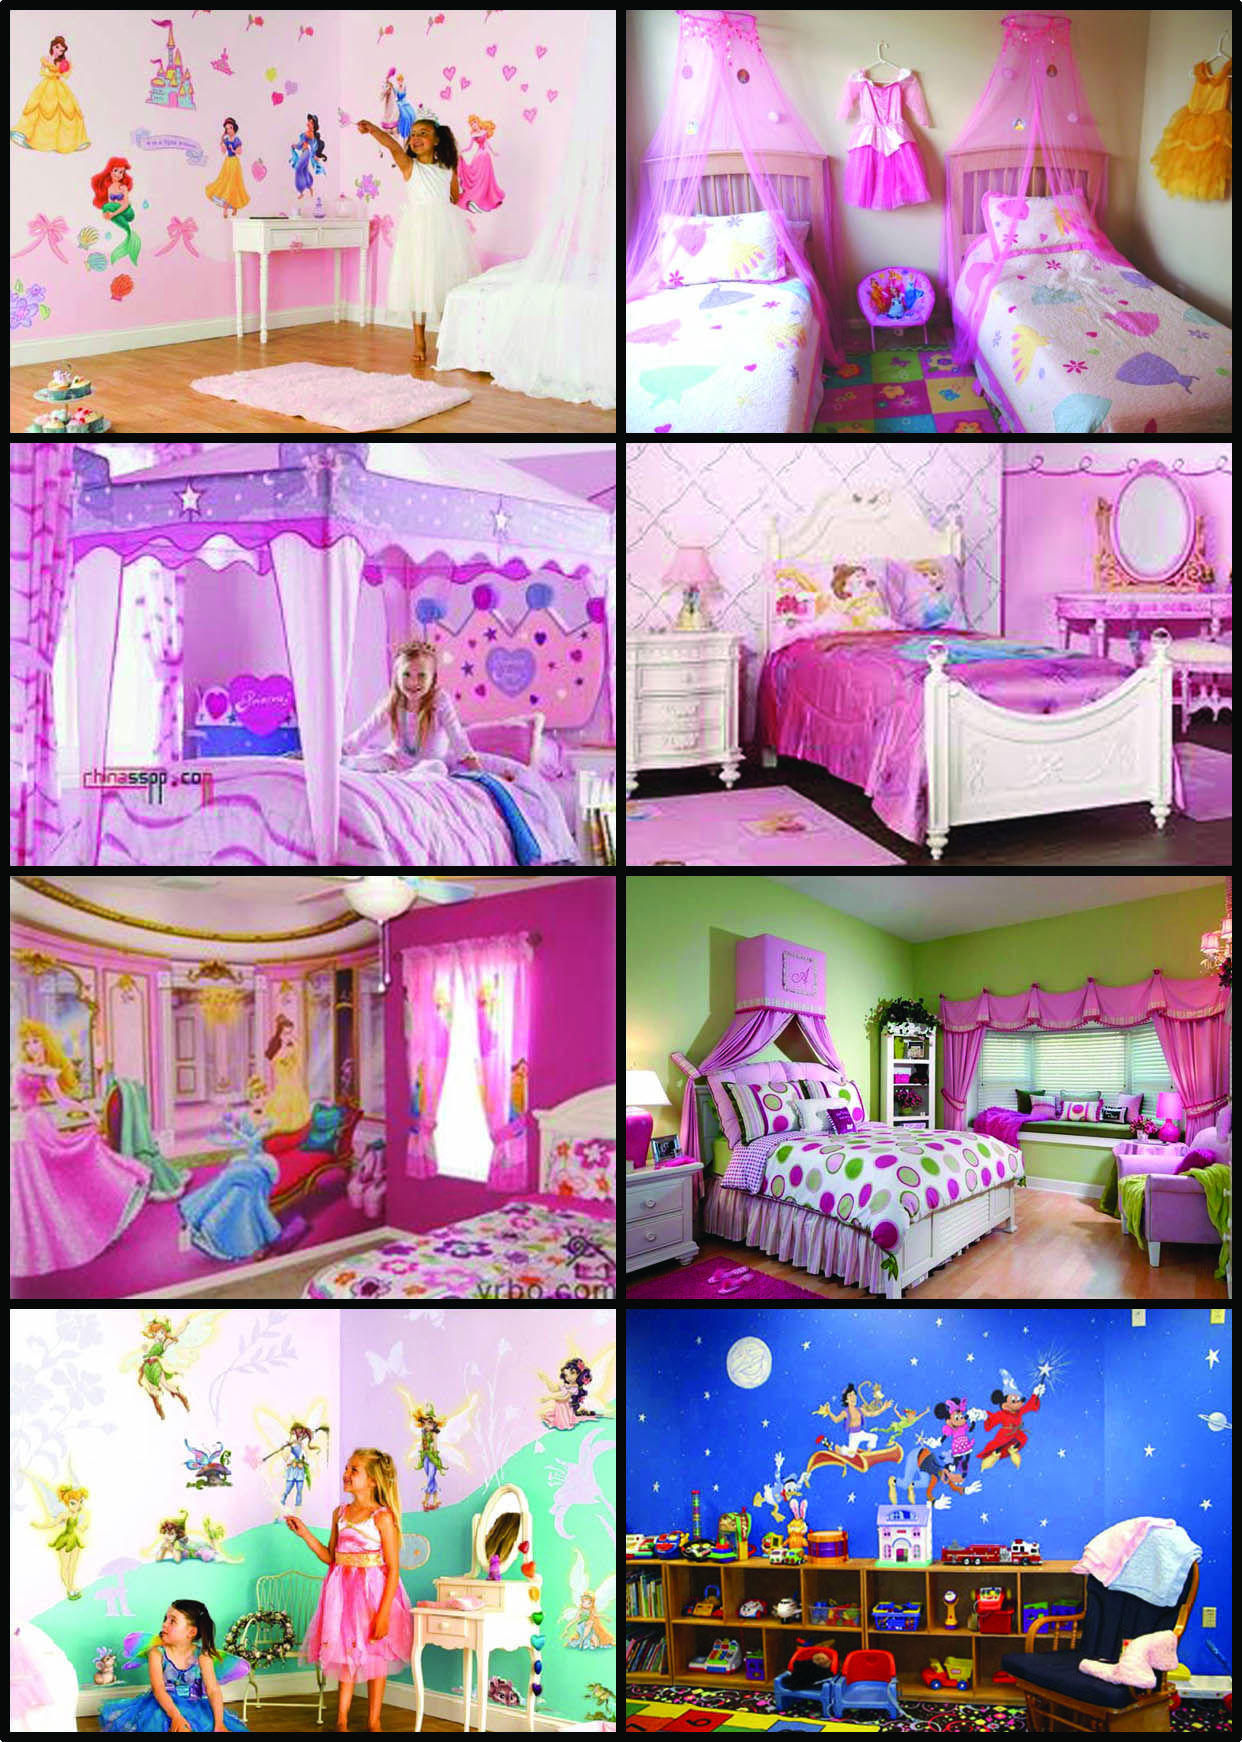 Disney themed bedroom ideas http www - Disney kinderzimmer ...